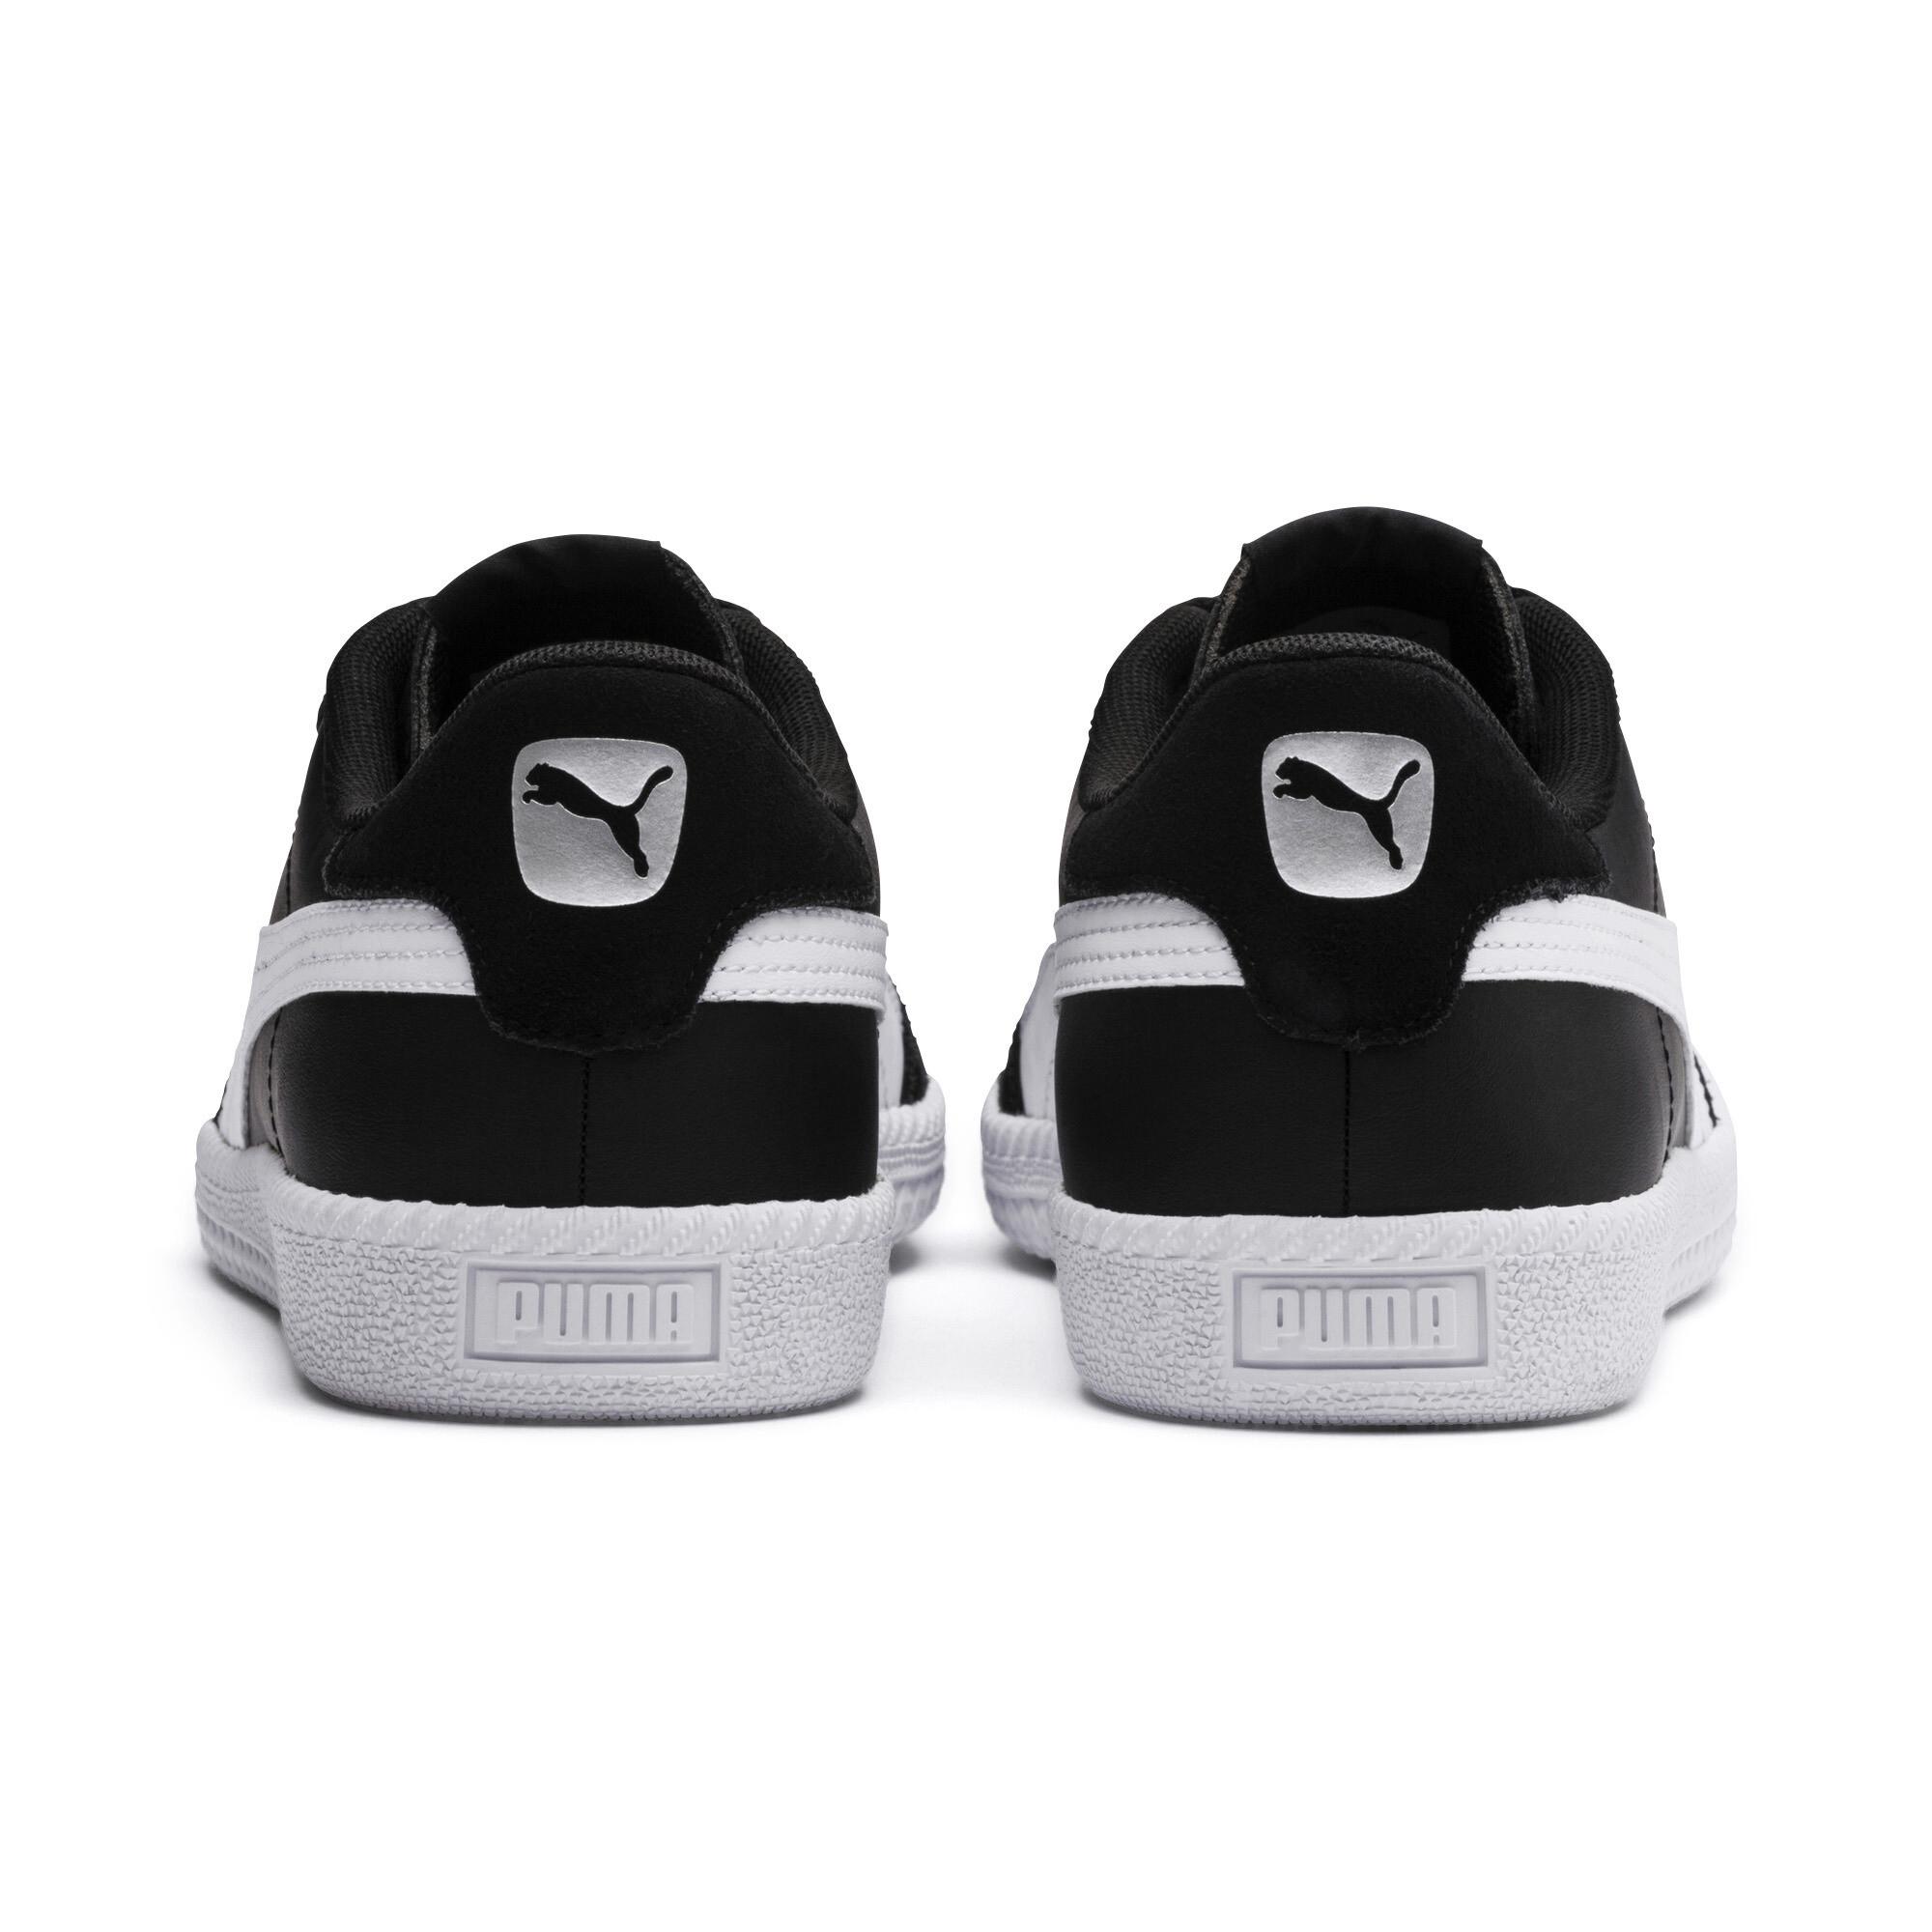 PUMA-Astro-Cup-Sneakers-Men-Shoe-Basics thumbnail 3